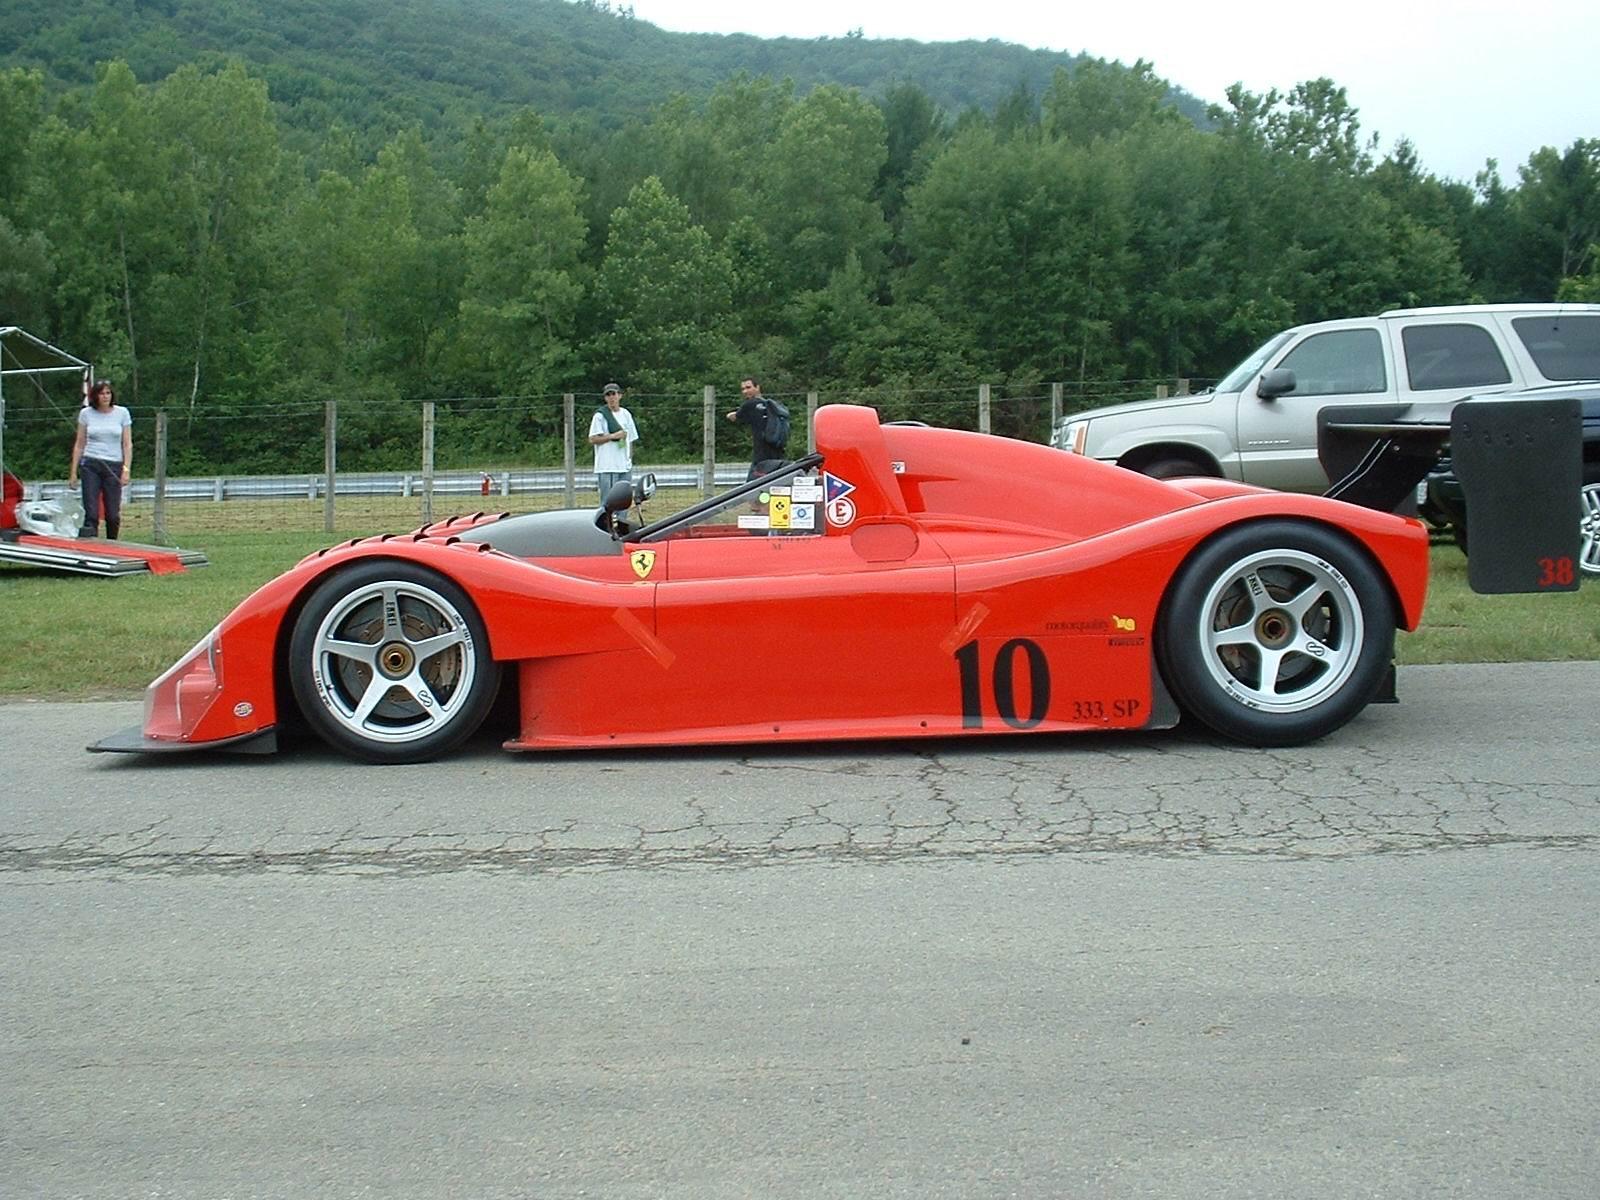 Ferrari 333 Sp Photos Photogallery With 9 Pics Carsbase Com